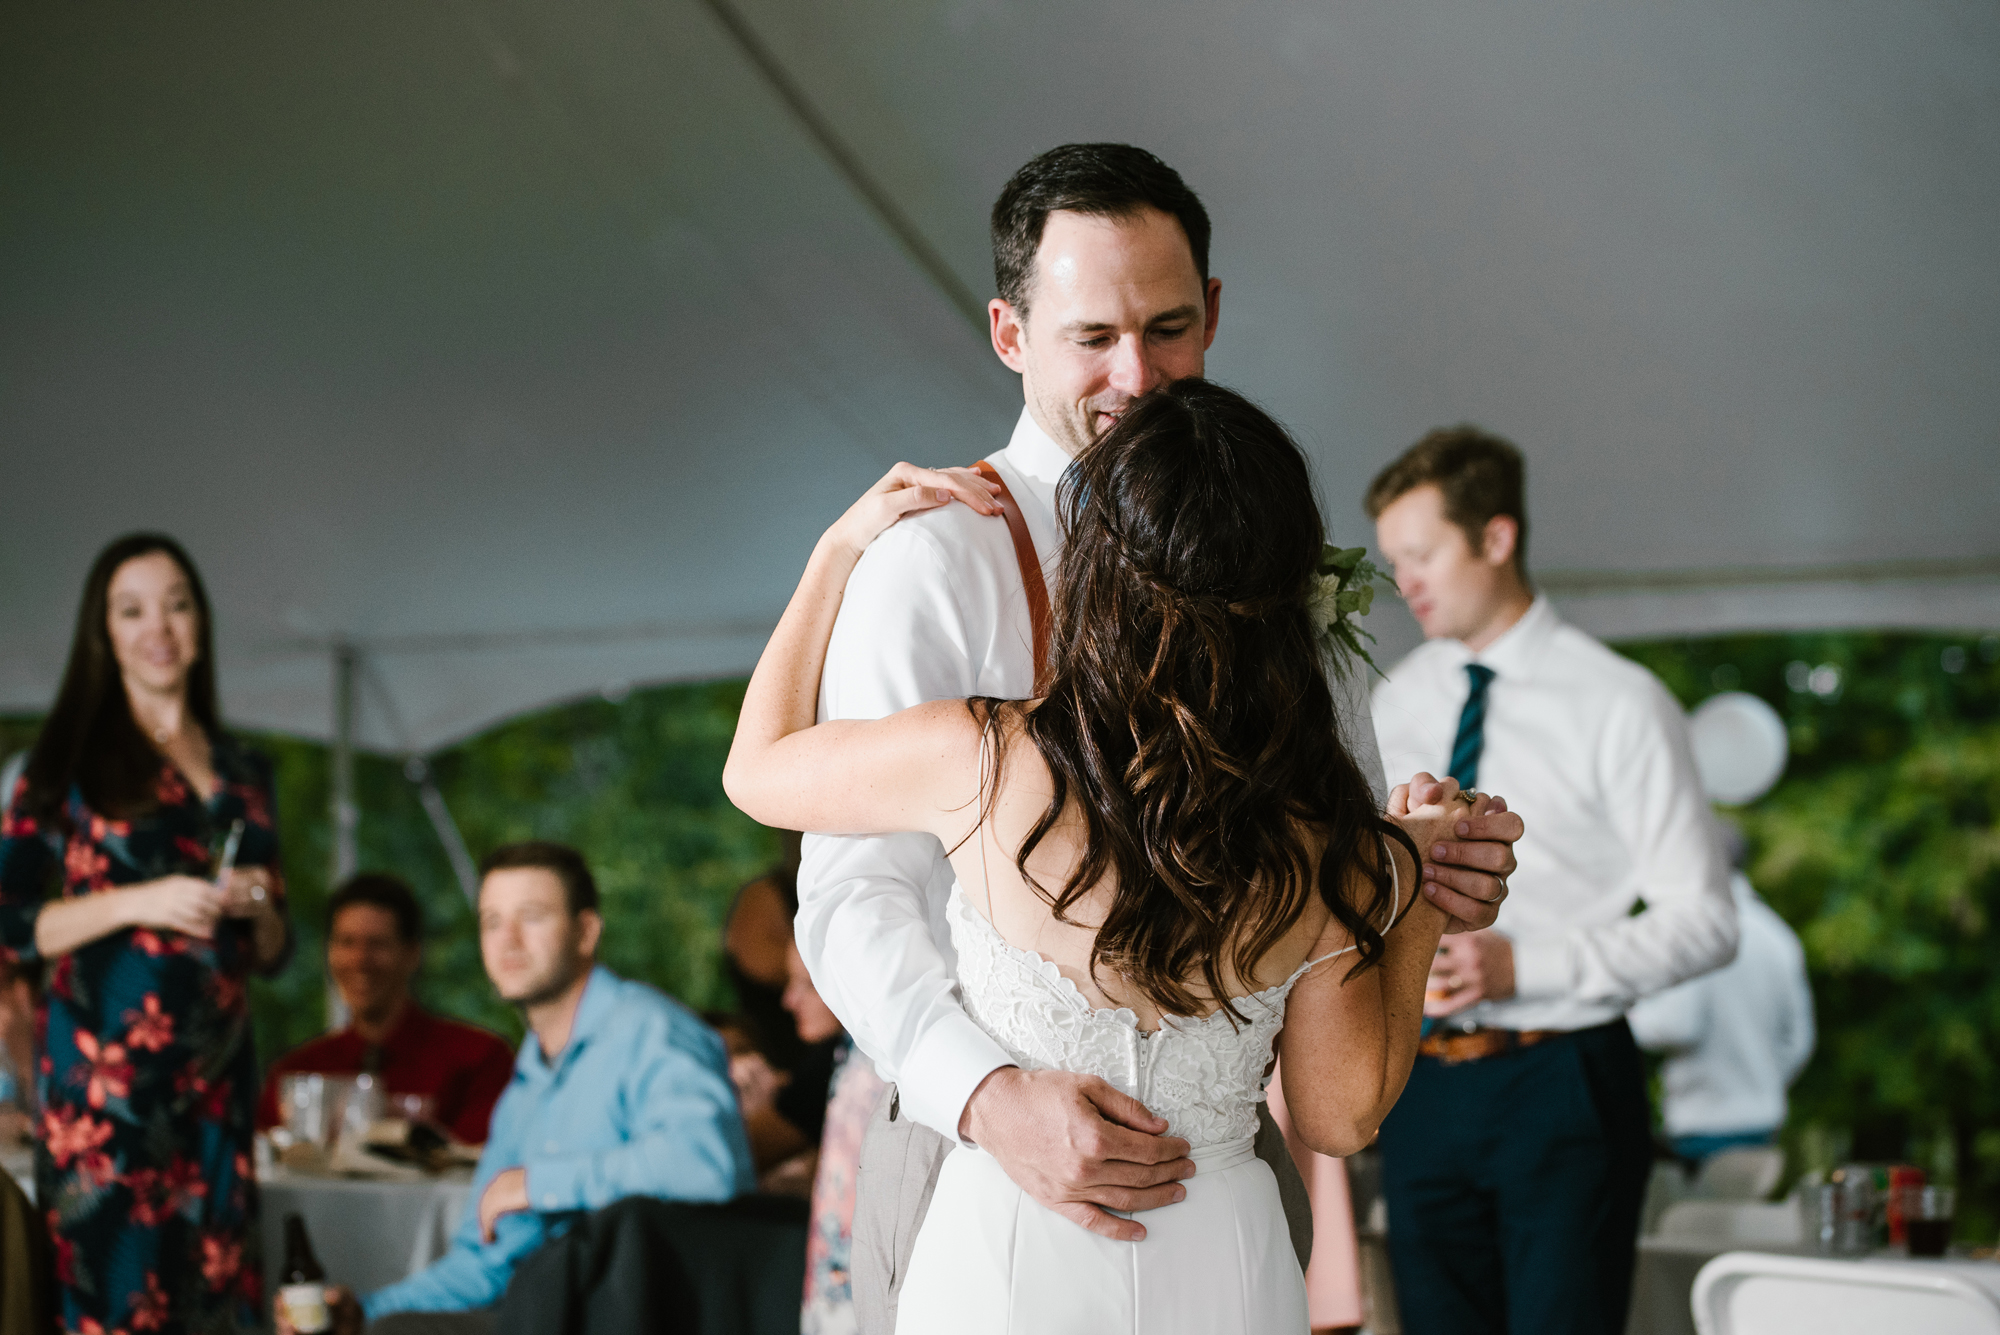 Quincy-Coldwater-Michigan-farm-wedding-photogapher-sydney-marie (447).jpg